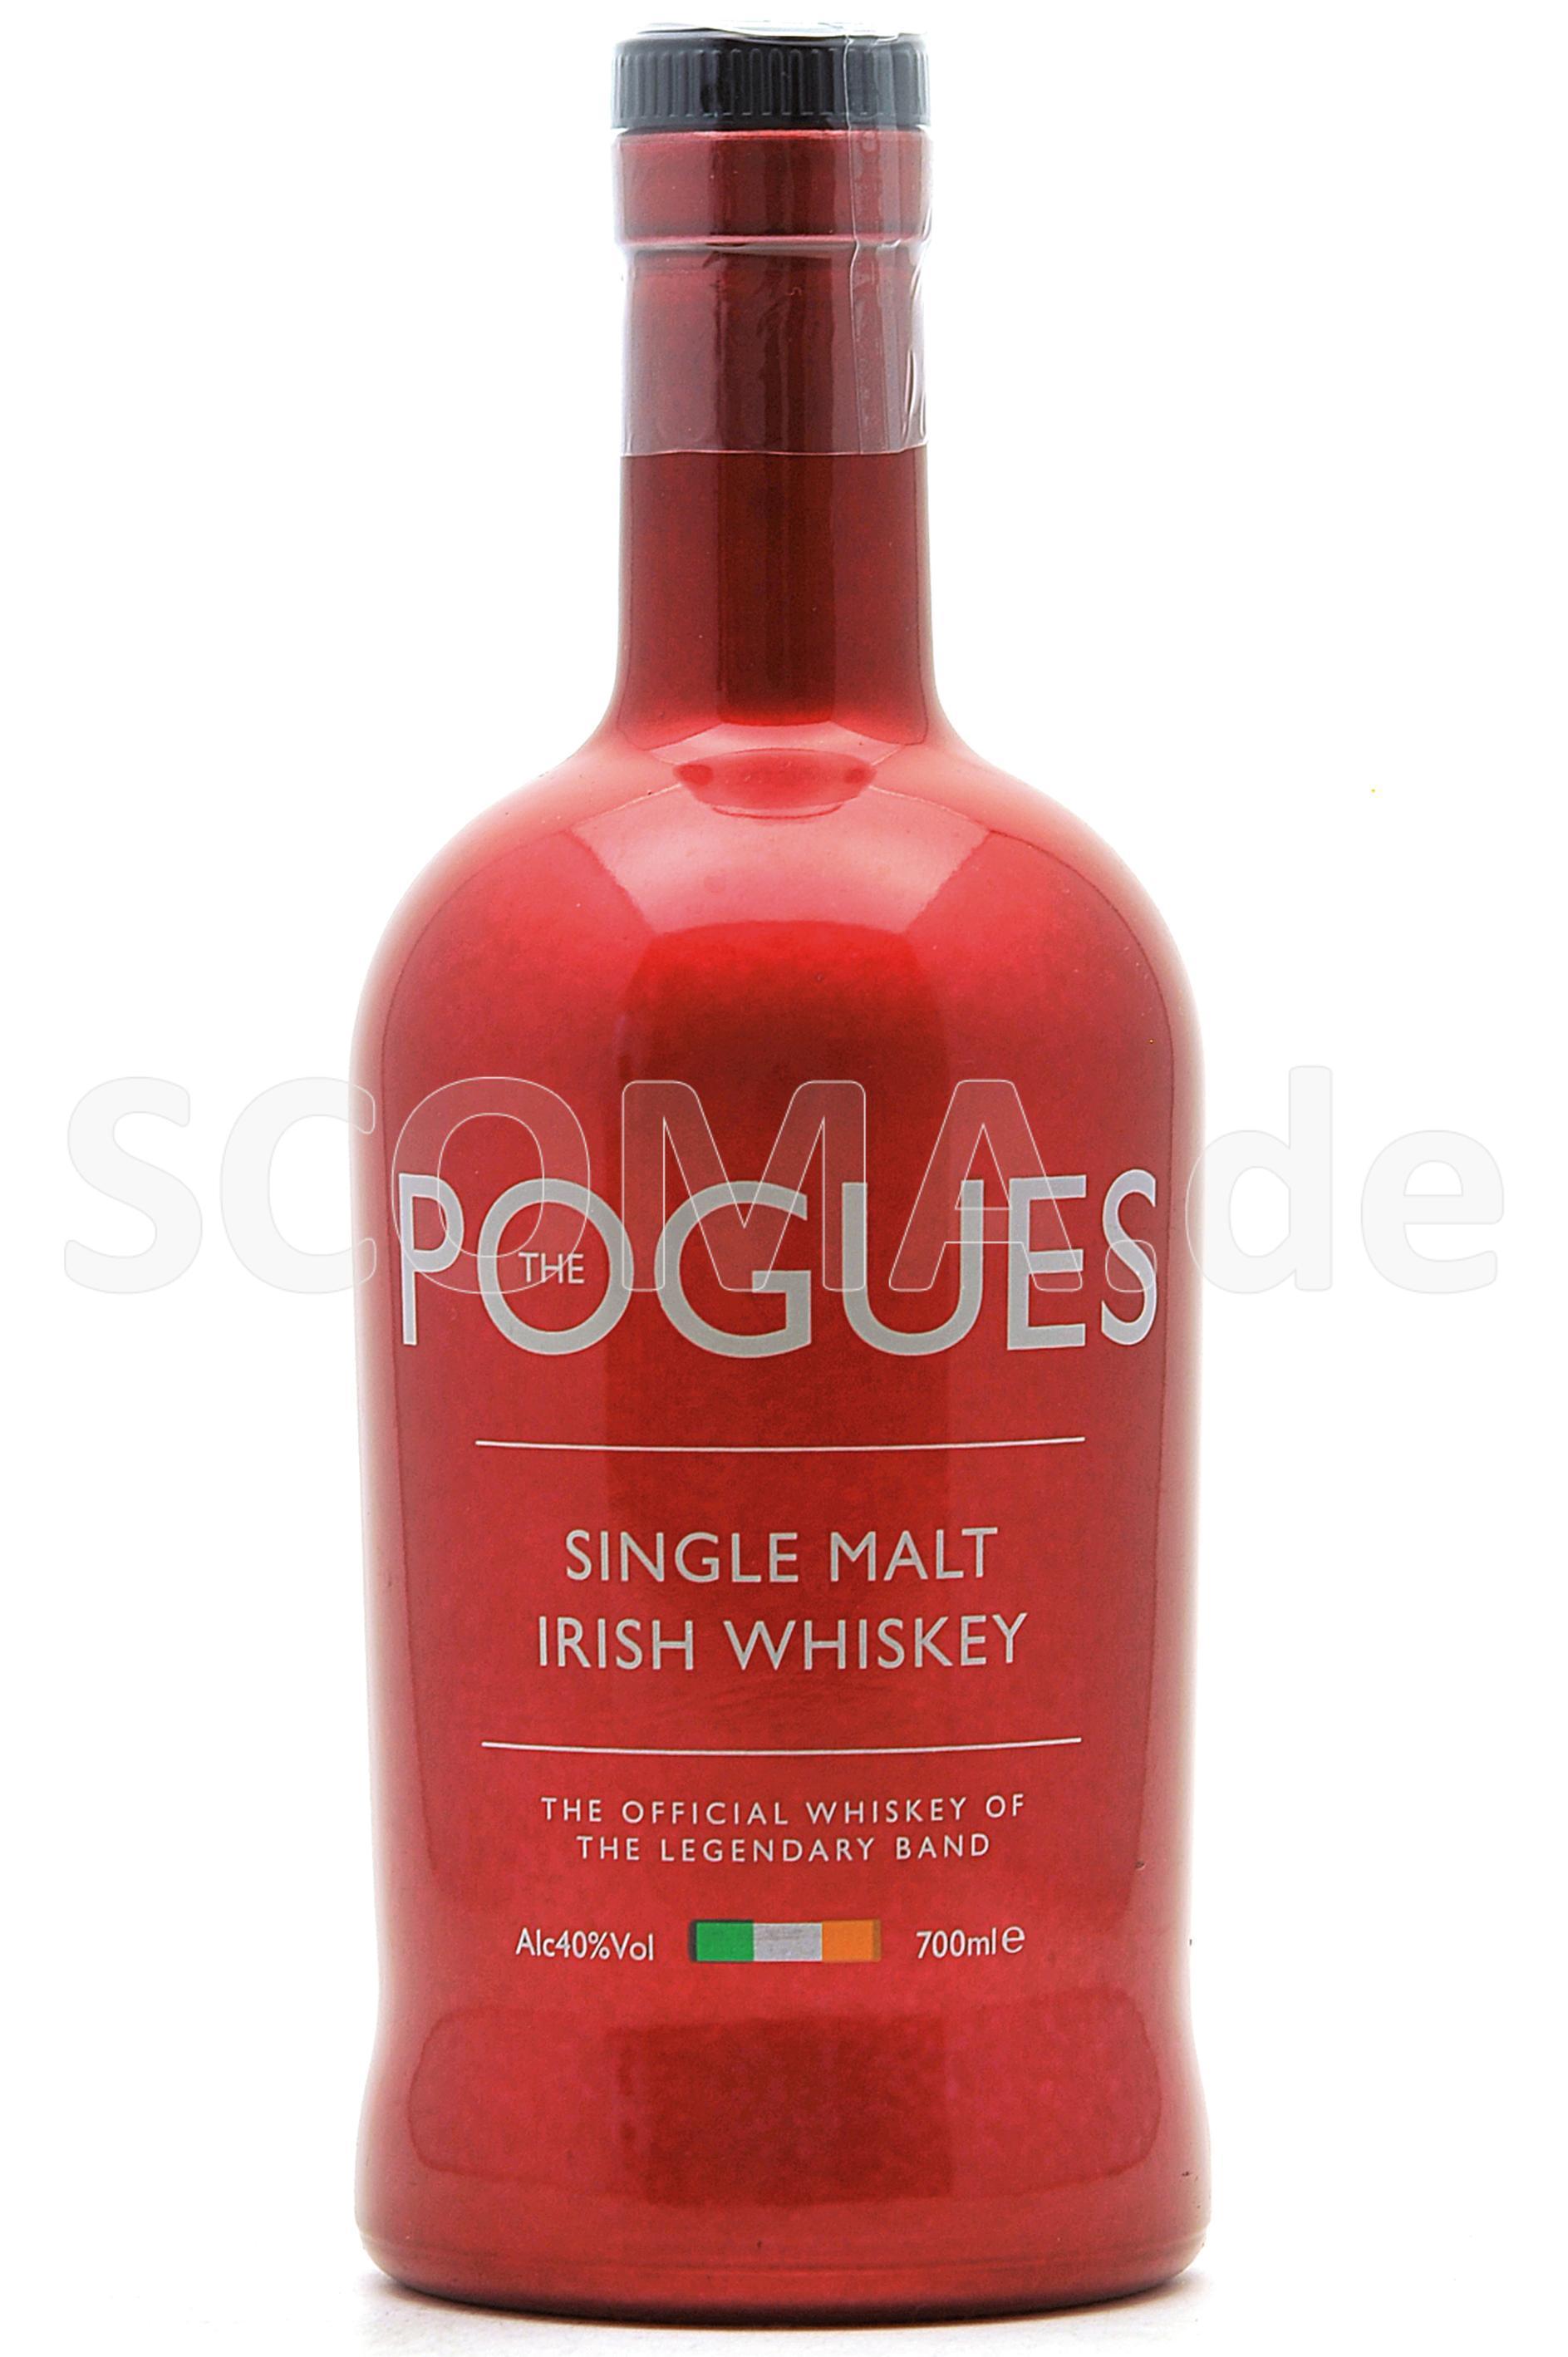 The Pogues Single Malt Whiskey